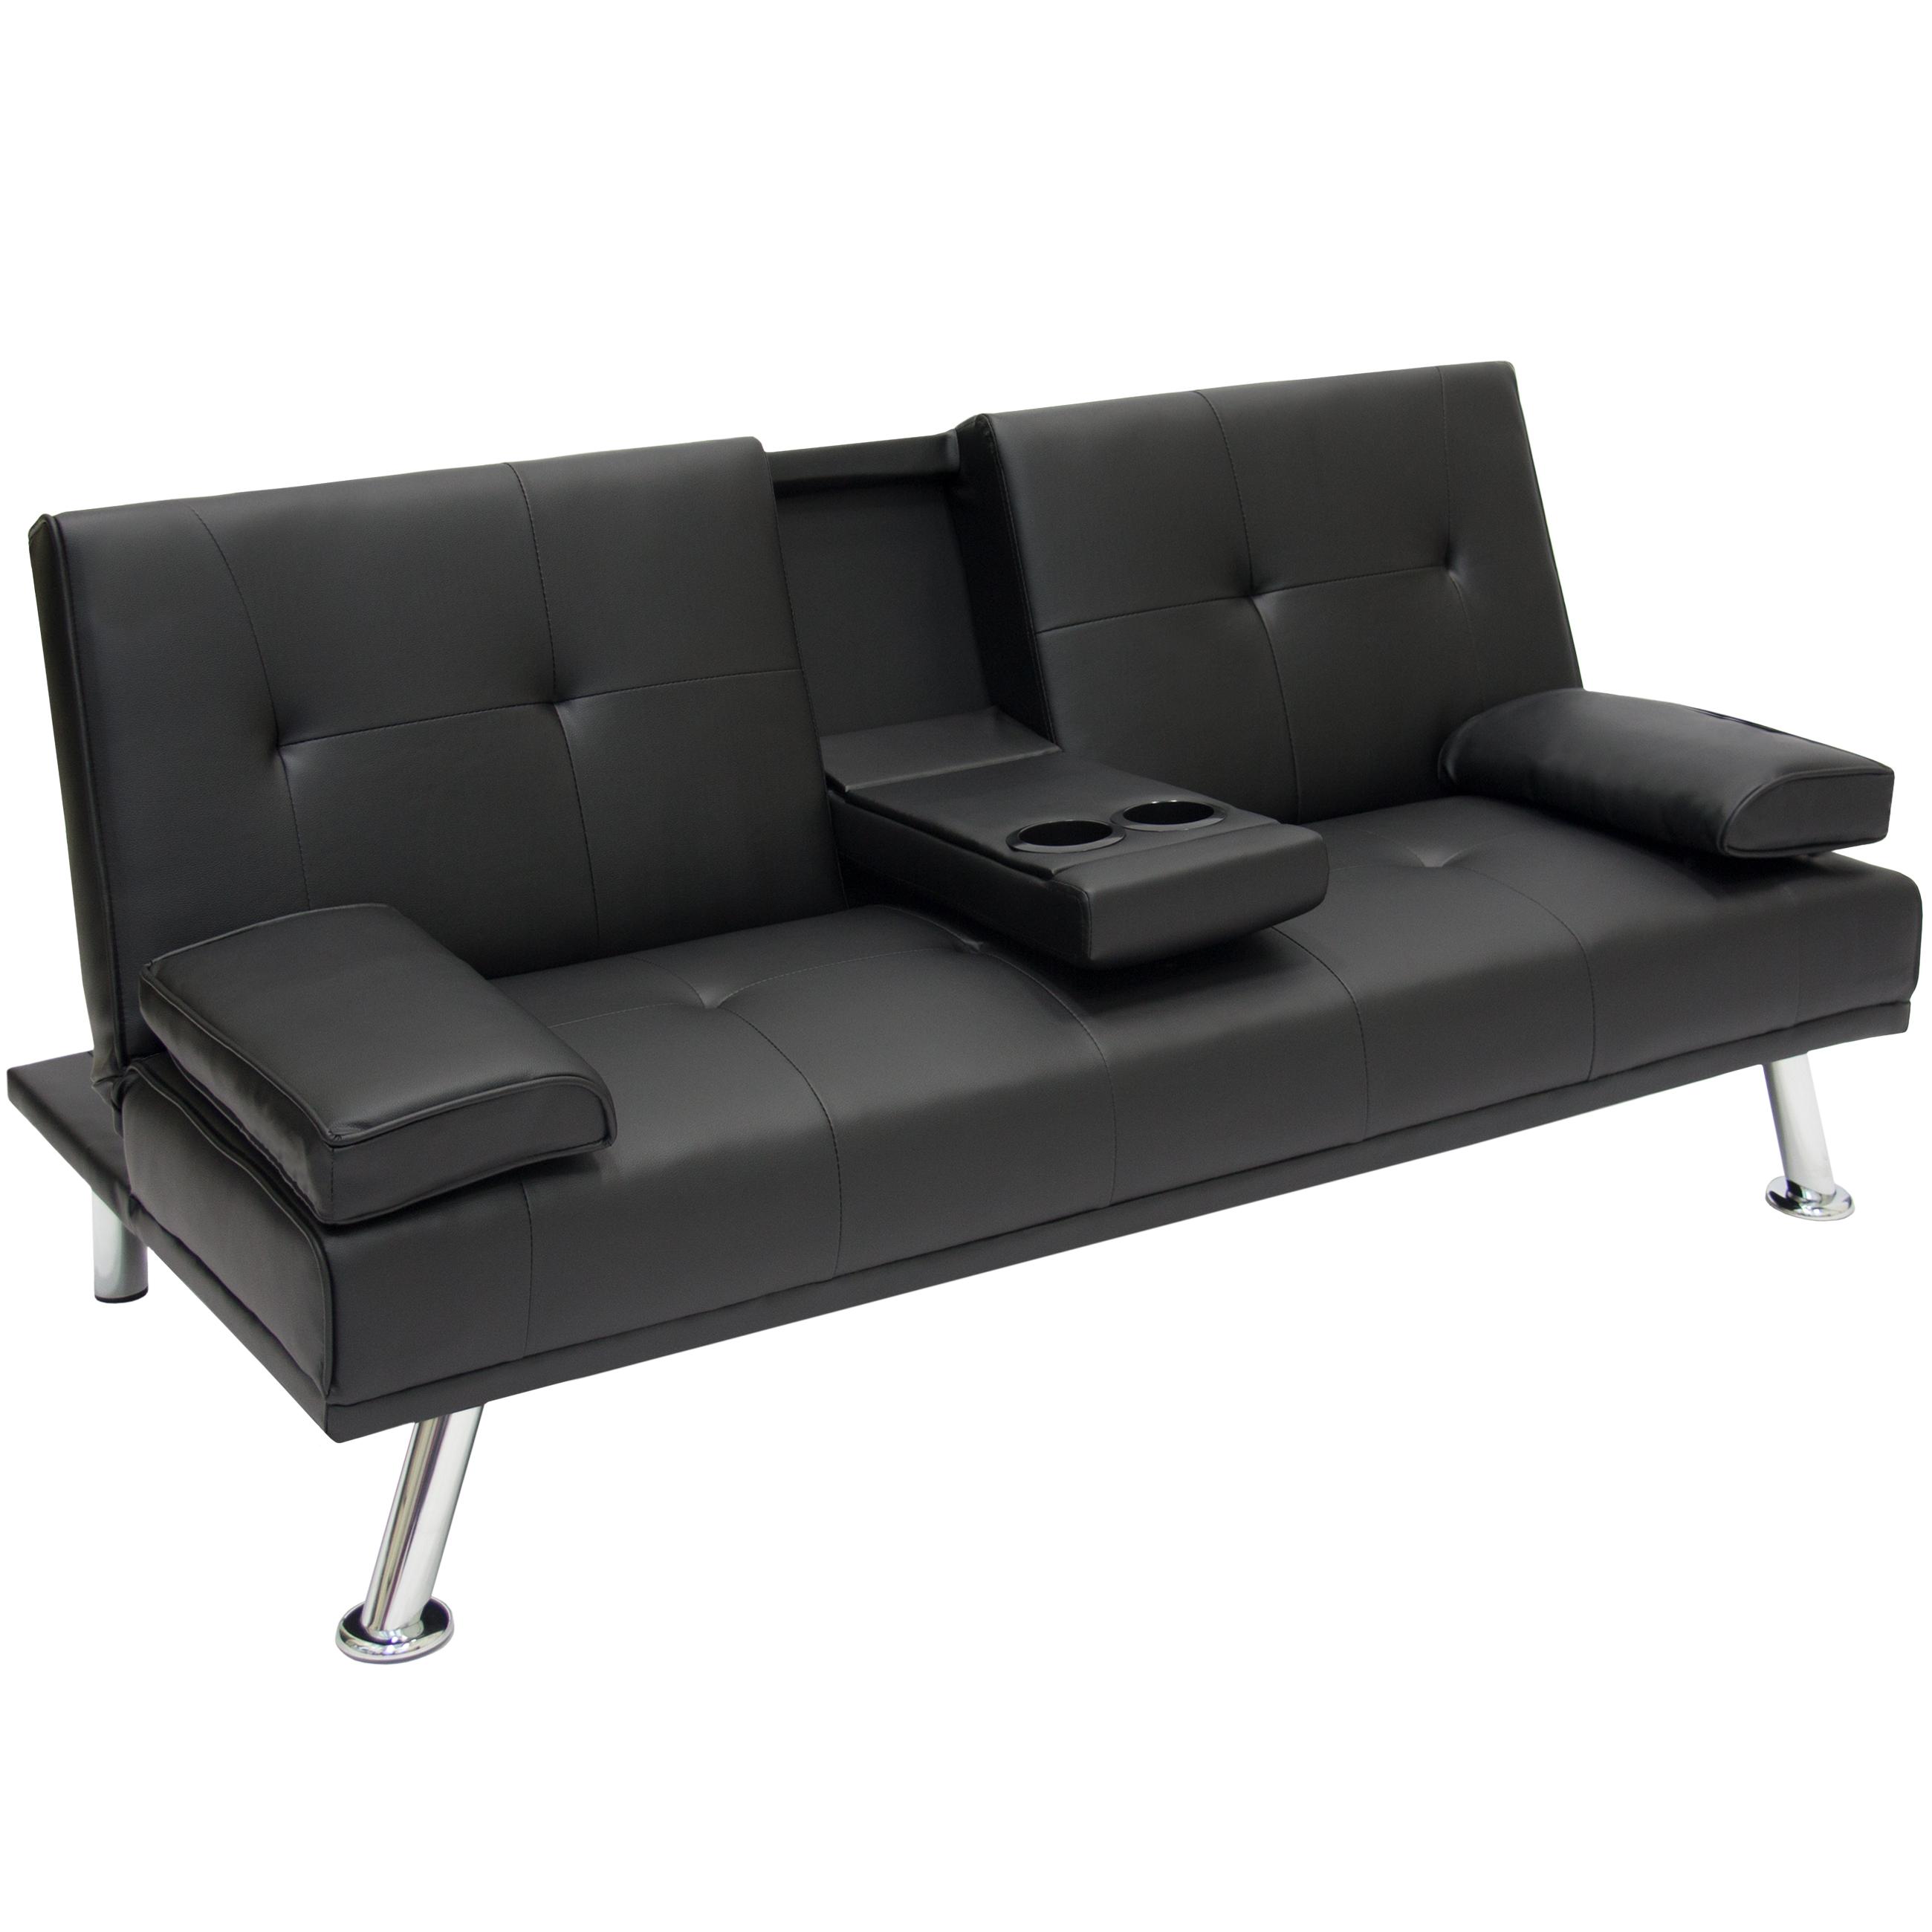 Entertainment Furniture Futon Sofa Bed Fold Up Down